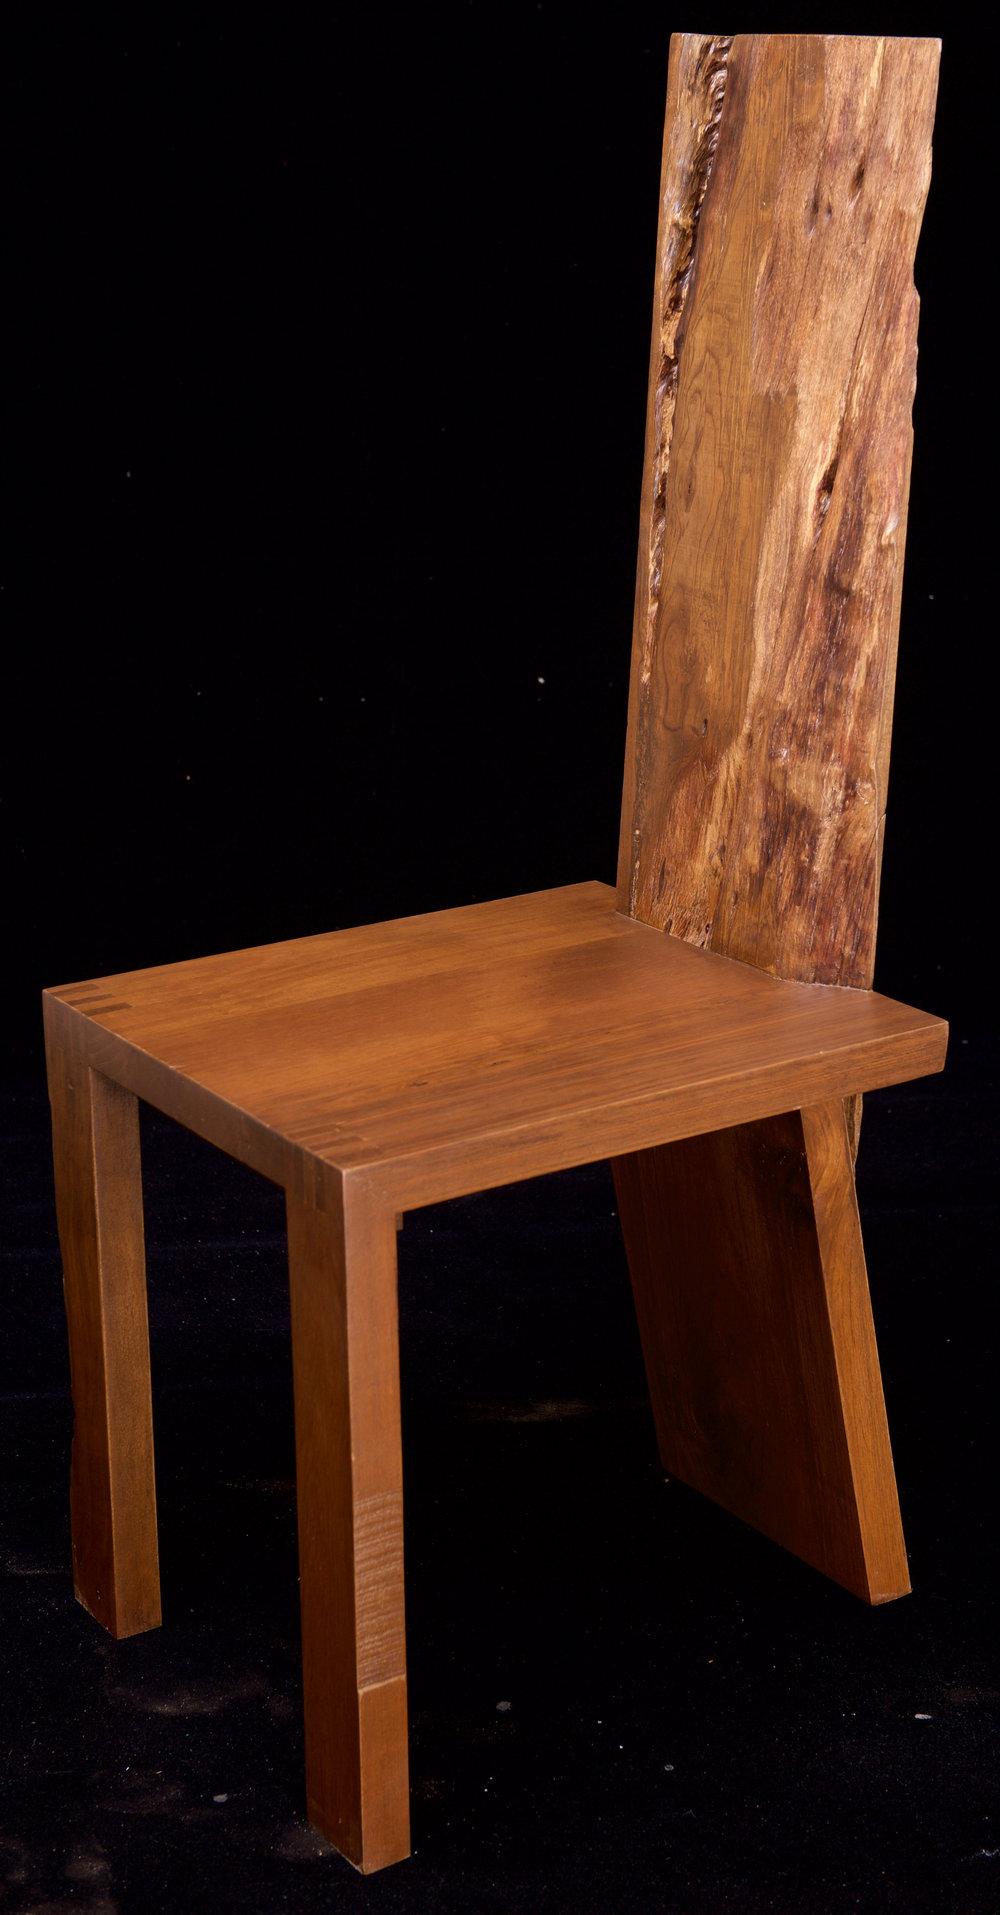 Techtona reclaimed burmese hardwood furniture